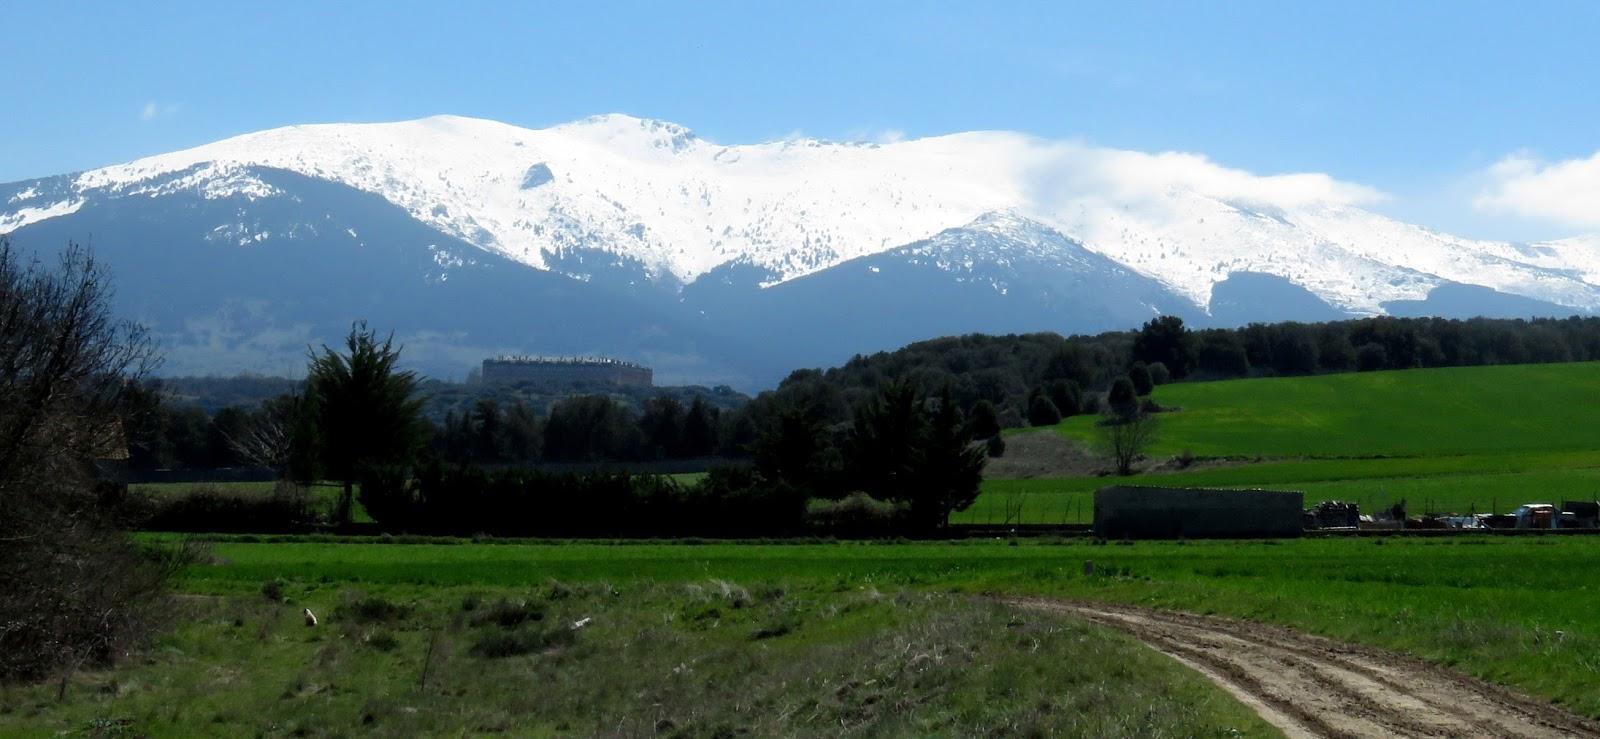 La Mujer Muerta Montana En La Sierra De Guadarrama Segovia